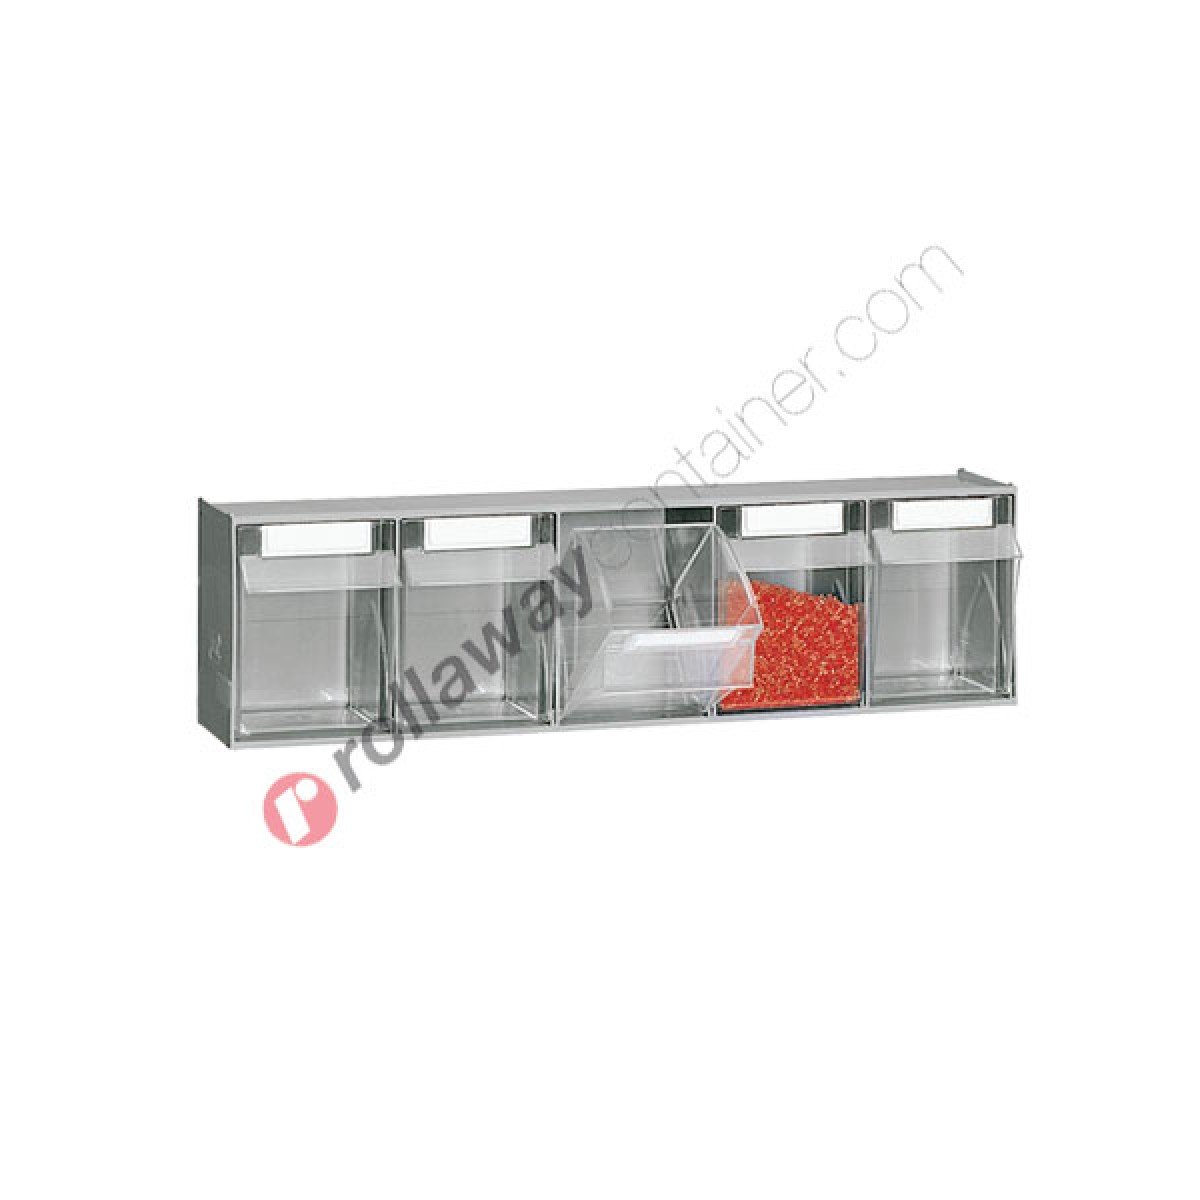 rangement visserie atelier 600 x 141 h 164 mm avec 5 tiroirs. Black Bedroom Furniture Sets. Home Design Ideas